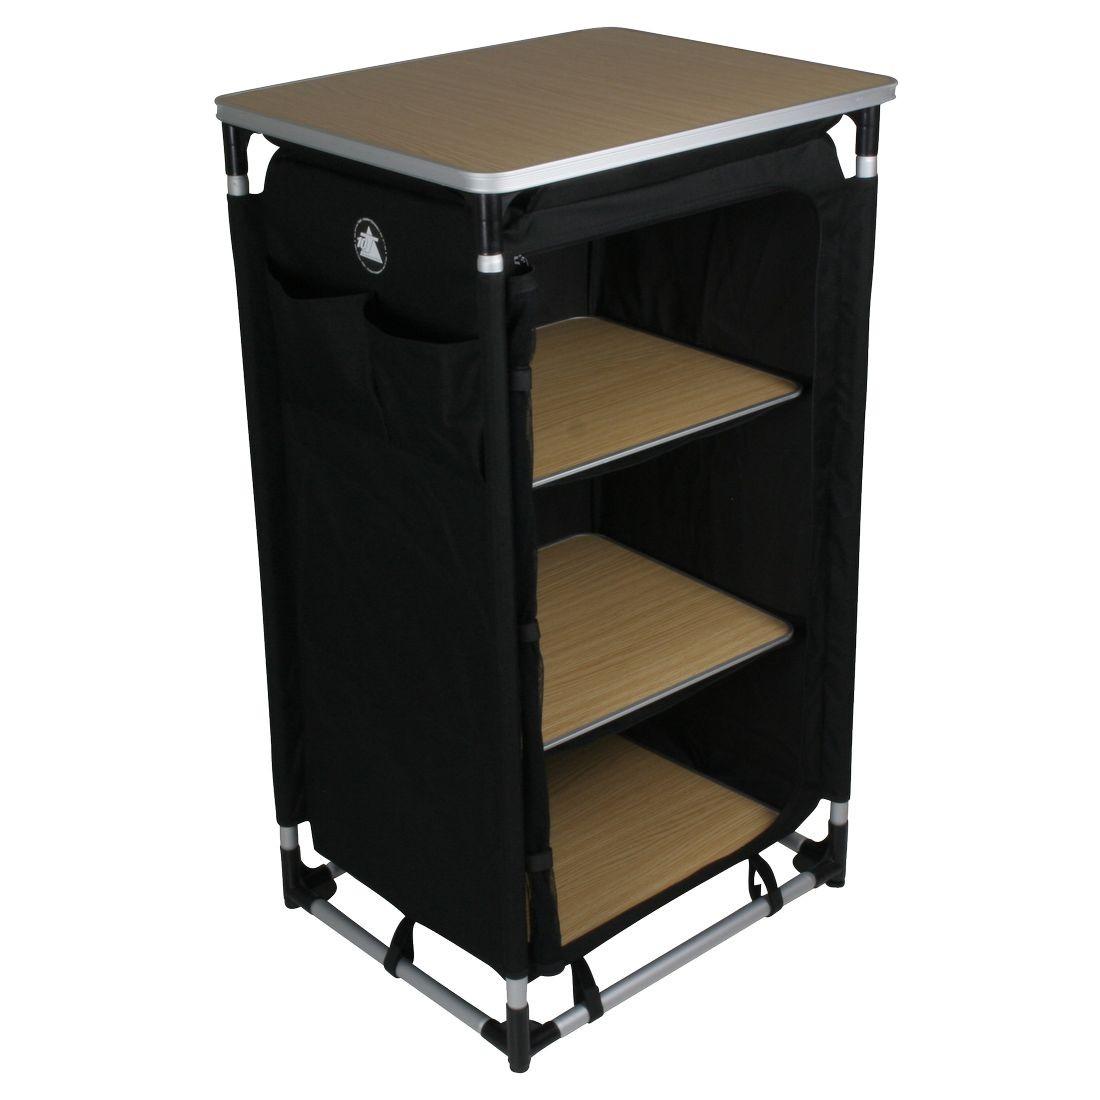 schrank outdoor finest under basin cabinet stela with schrank outdoor amazing outdoor schrank. Black Bedroom Furniture Sets. Home Design Ideas